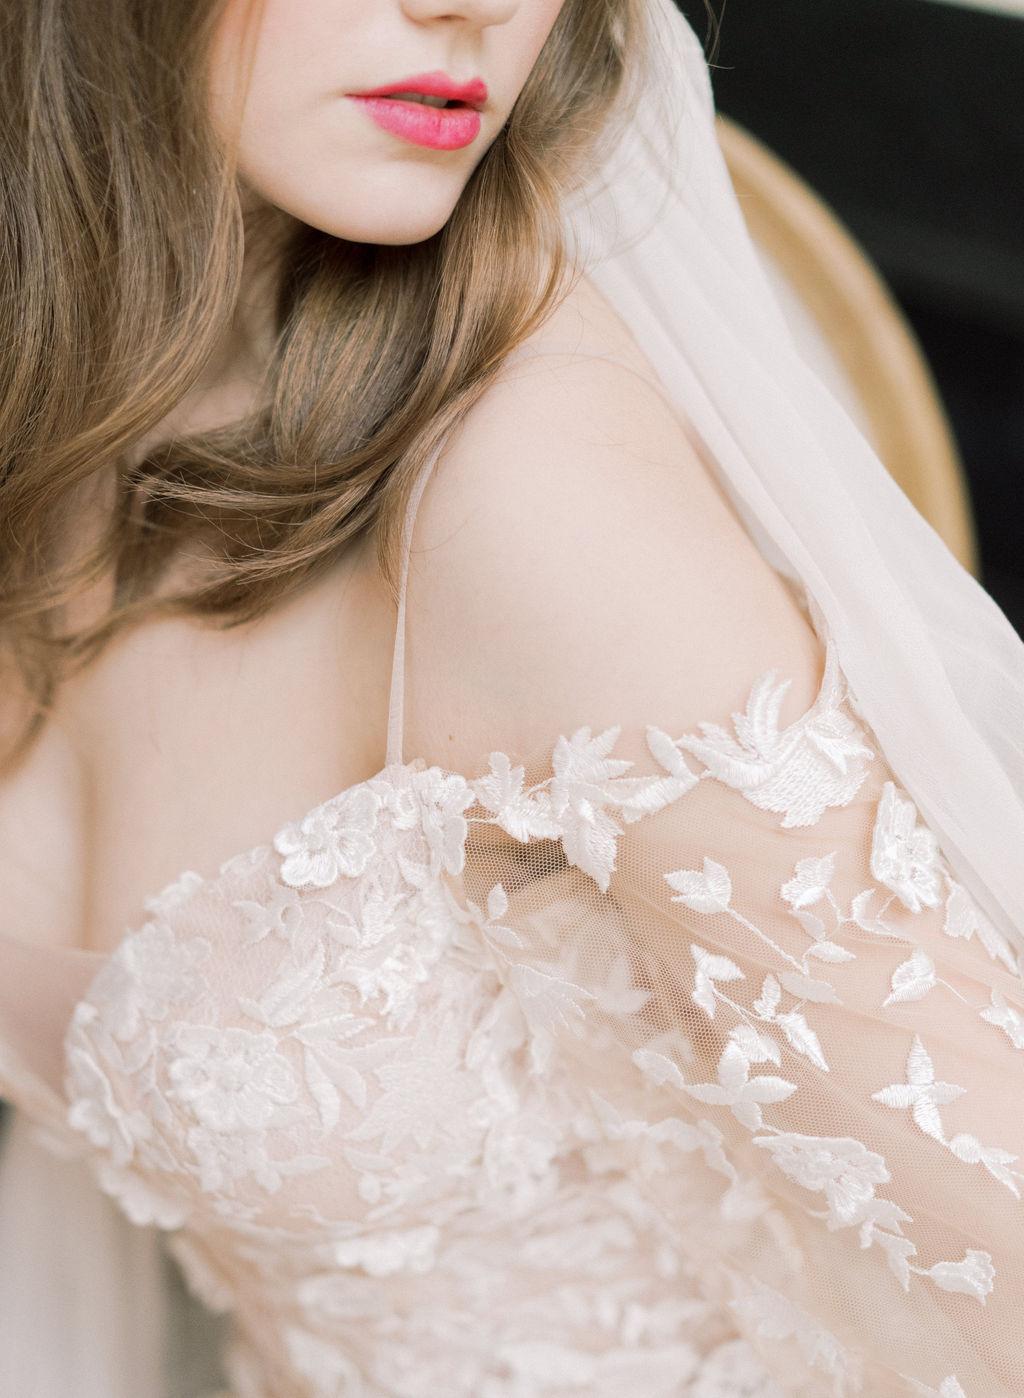 artiese-ago-wedding-editorial-06768.jpg